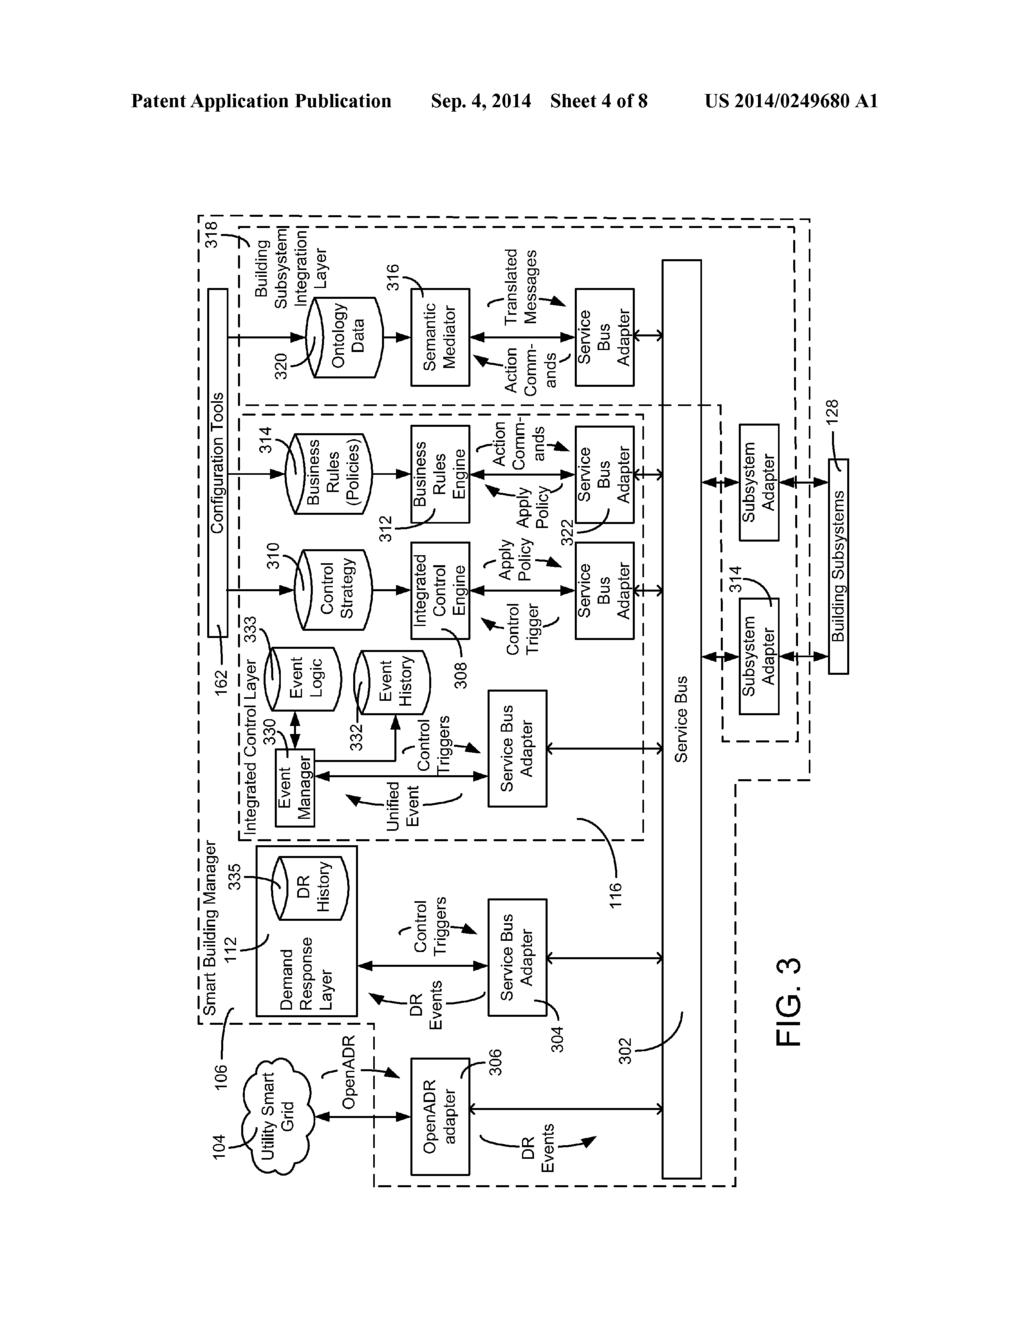 bms system wiring diagram ezgo gas golf cart building management schematic 44